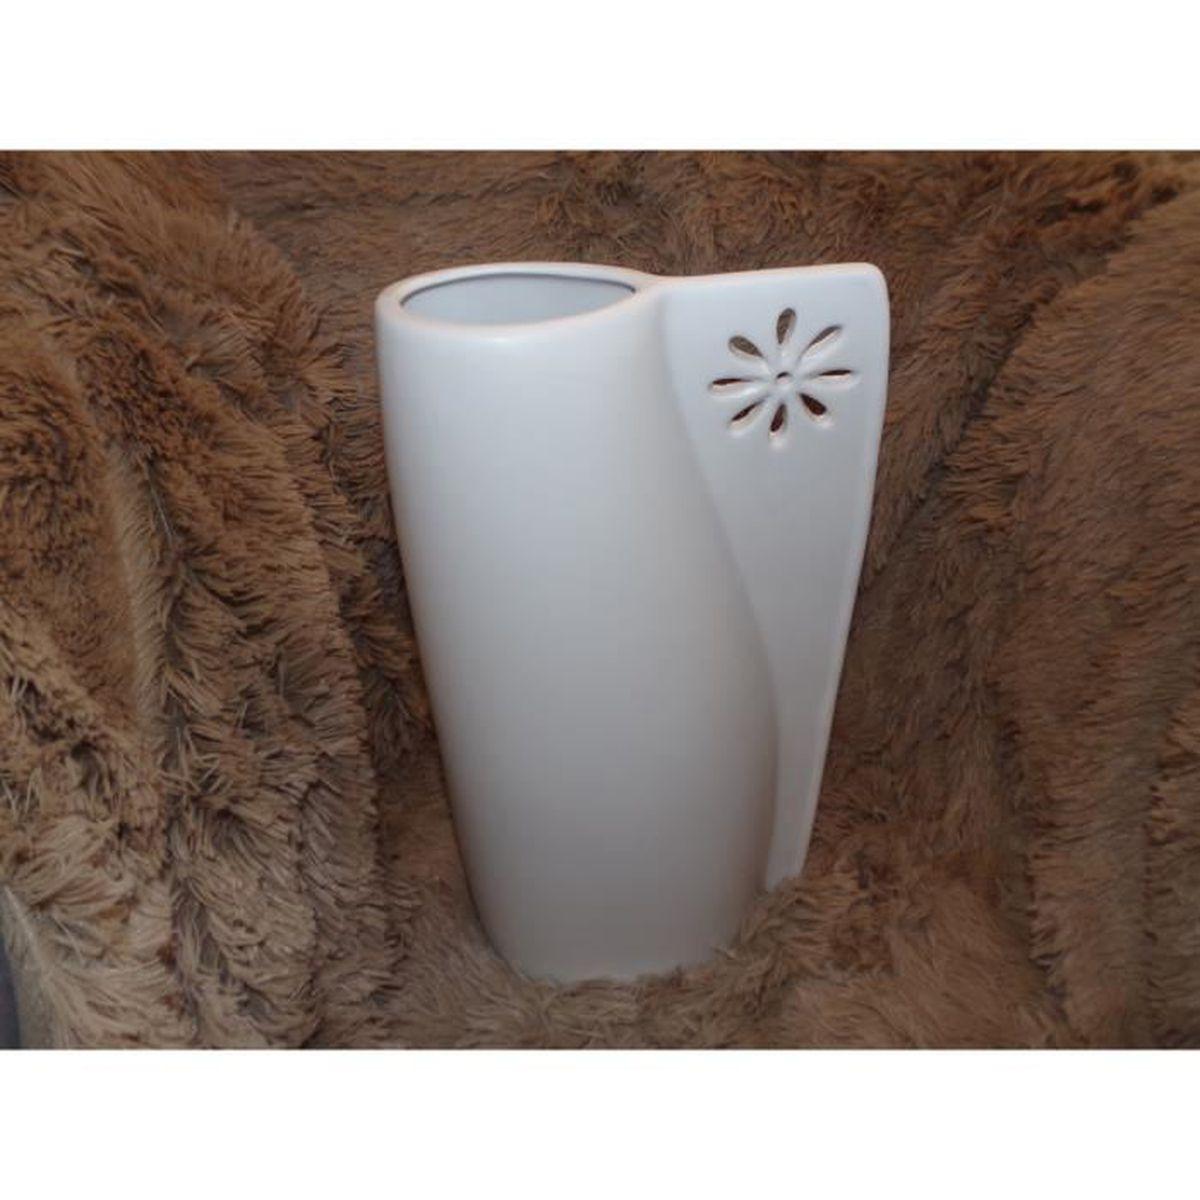 grand vase ceramique achat vente pas cher. Black Bedroom Furniture Sets. Home Design Ideas